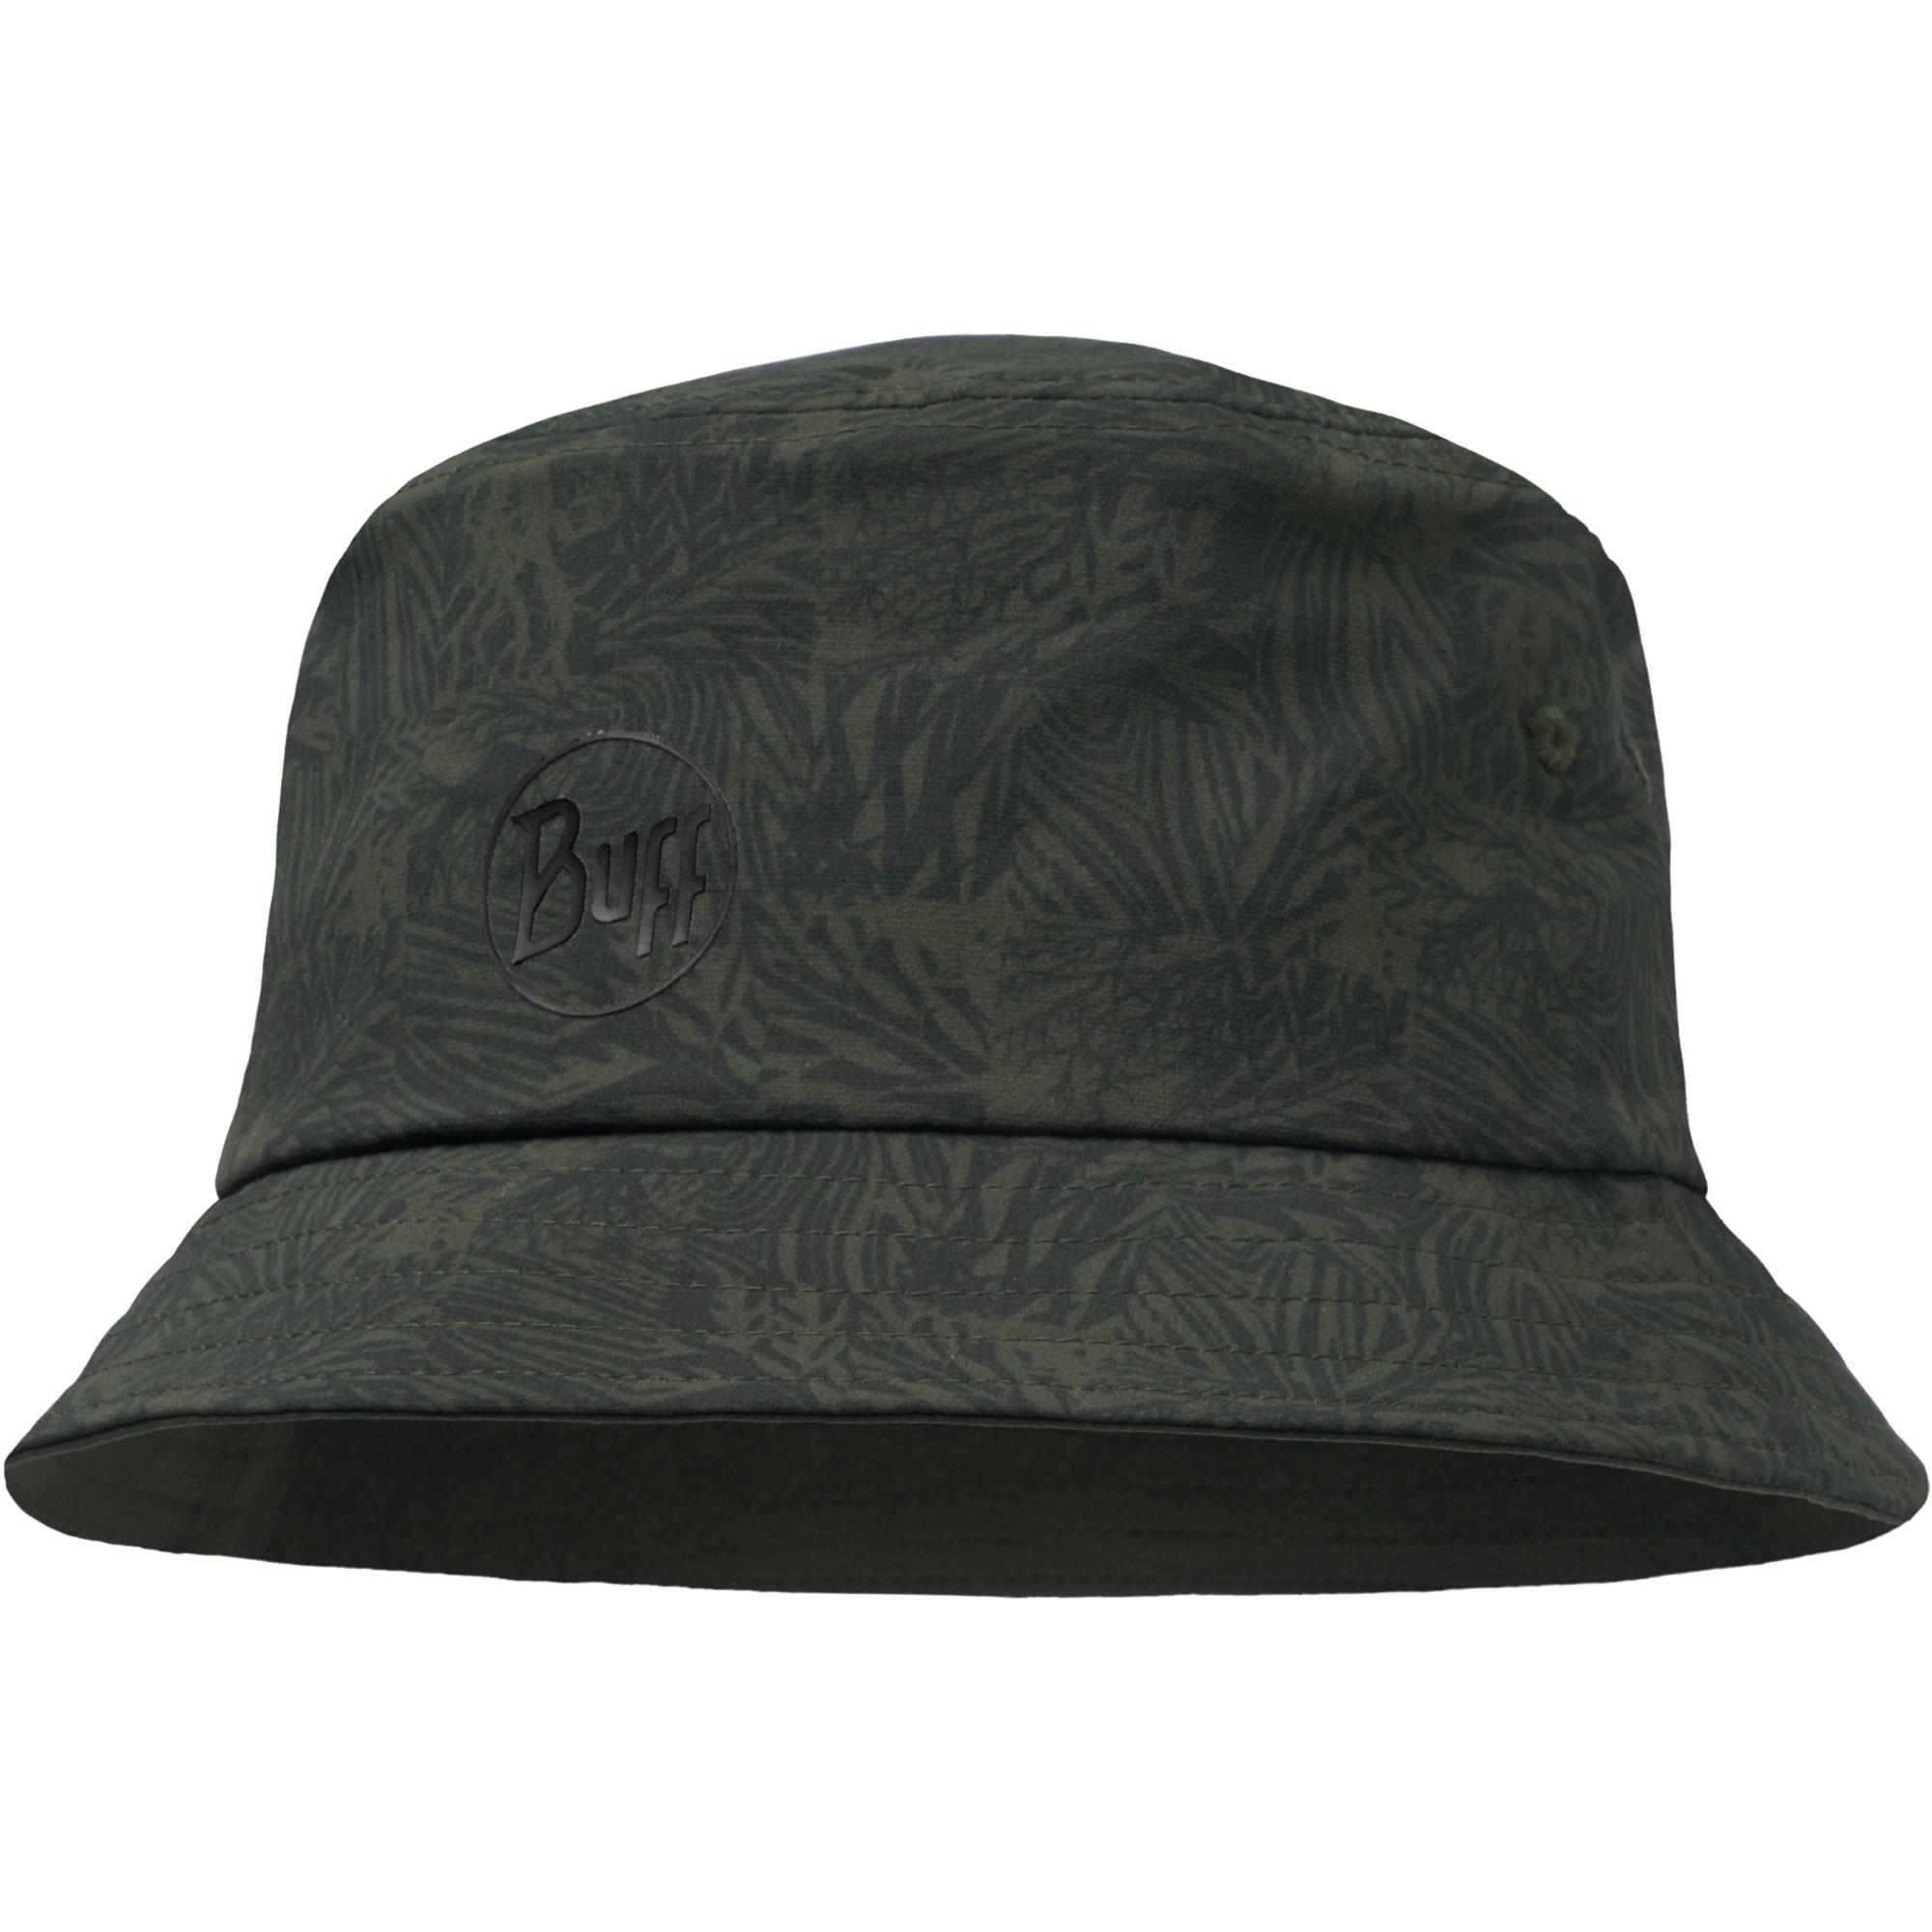 3dcc6e563e1 ... Buff Trek Bucket Hat - Checkboard Moss Green ...